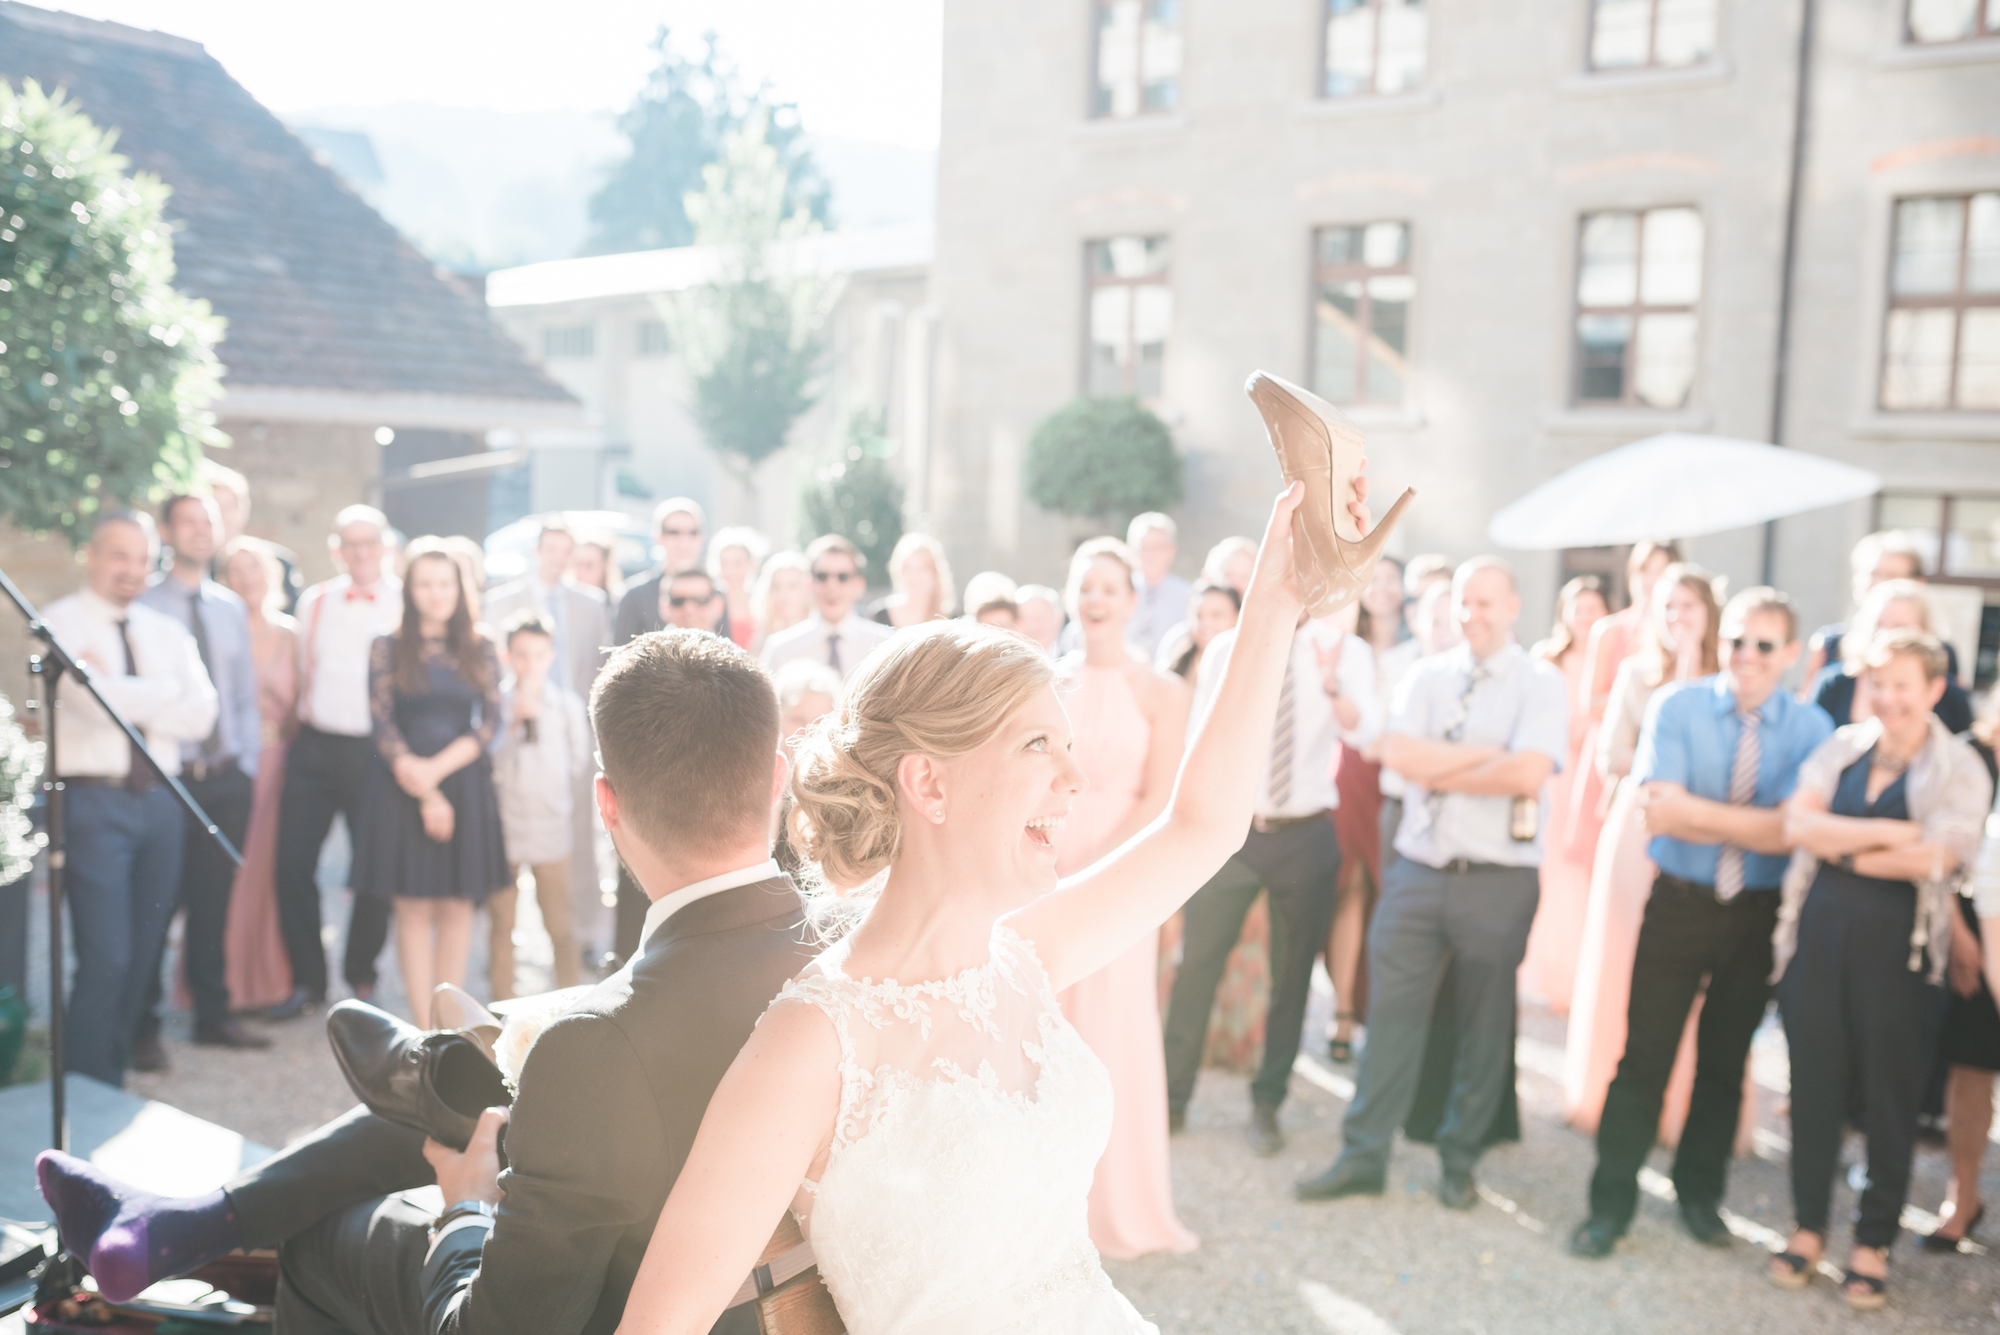 NadiaundMichael_Hochzeit_BekaBitterliFotografie_596.jpg